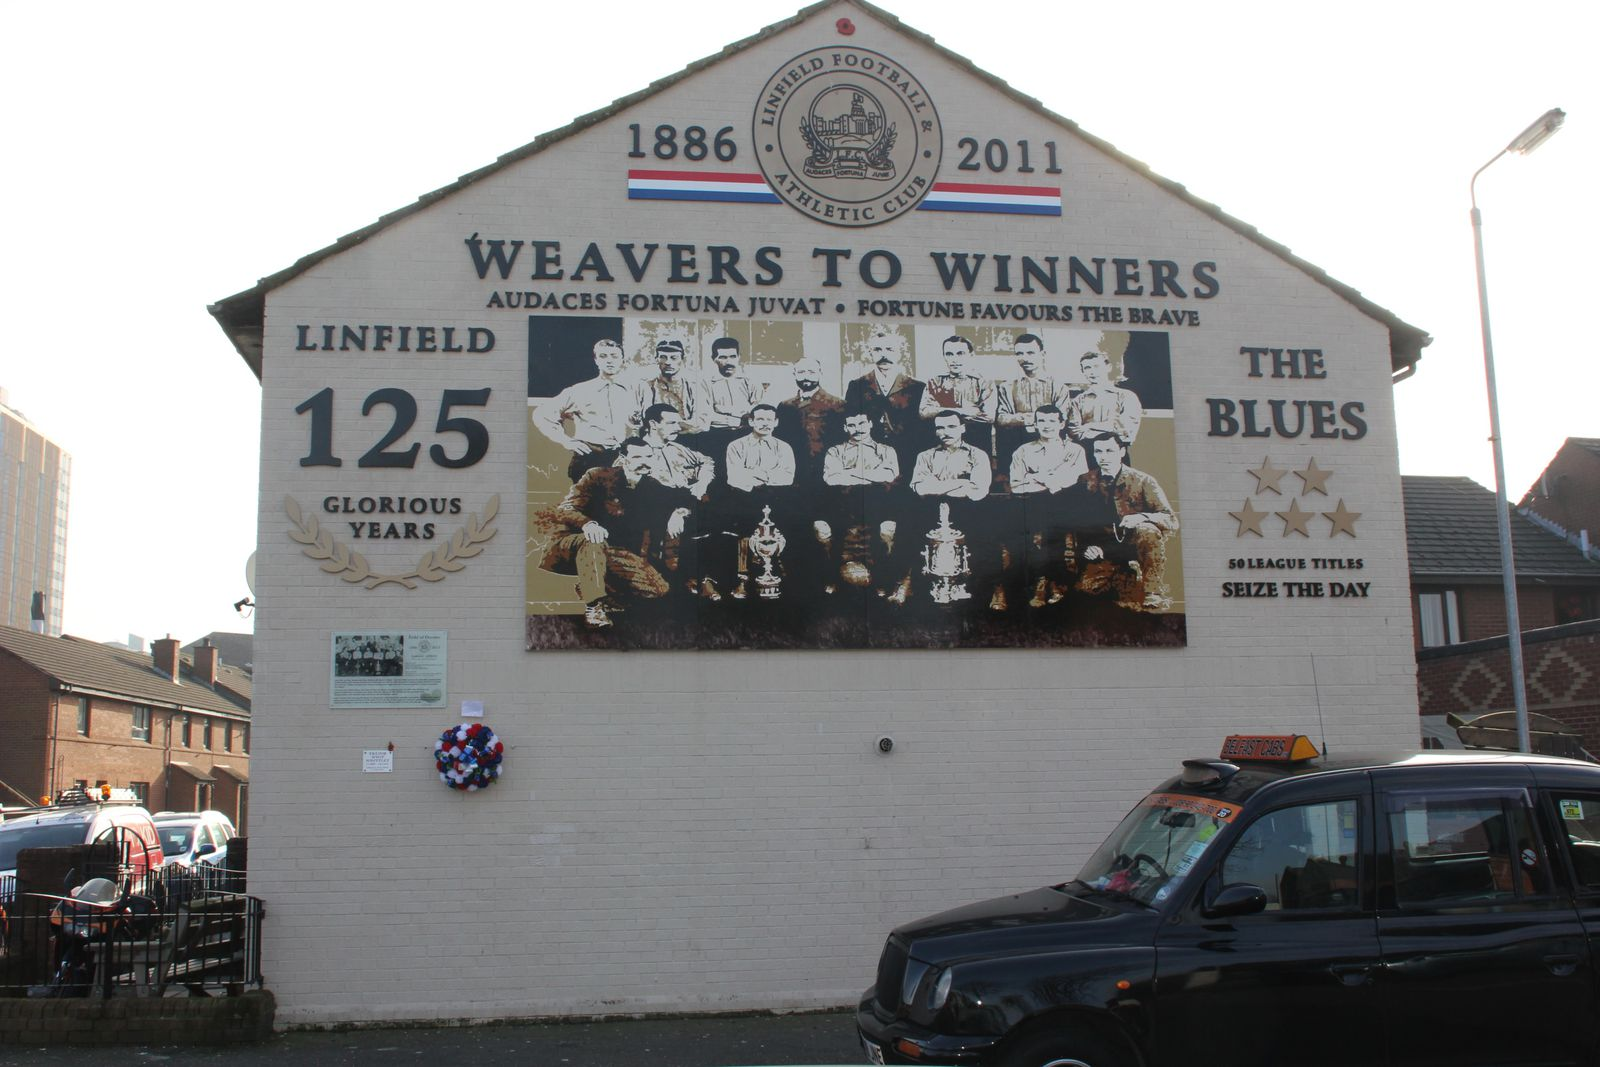 446) Sandy Row, South Belfast